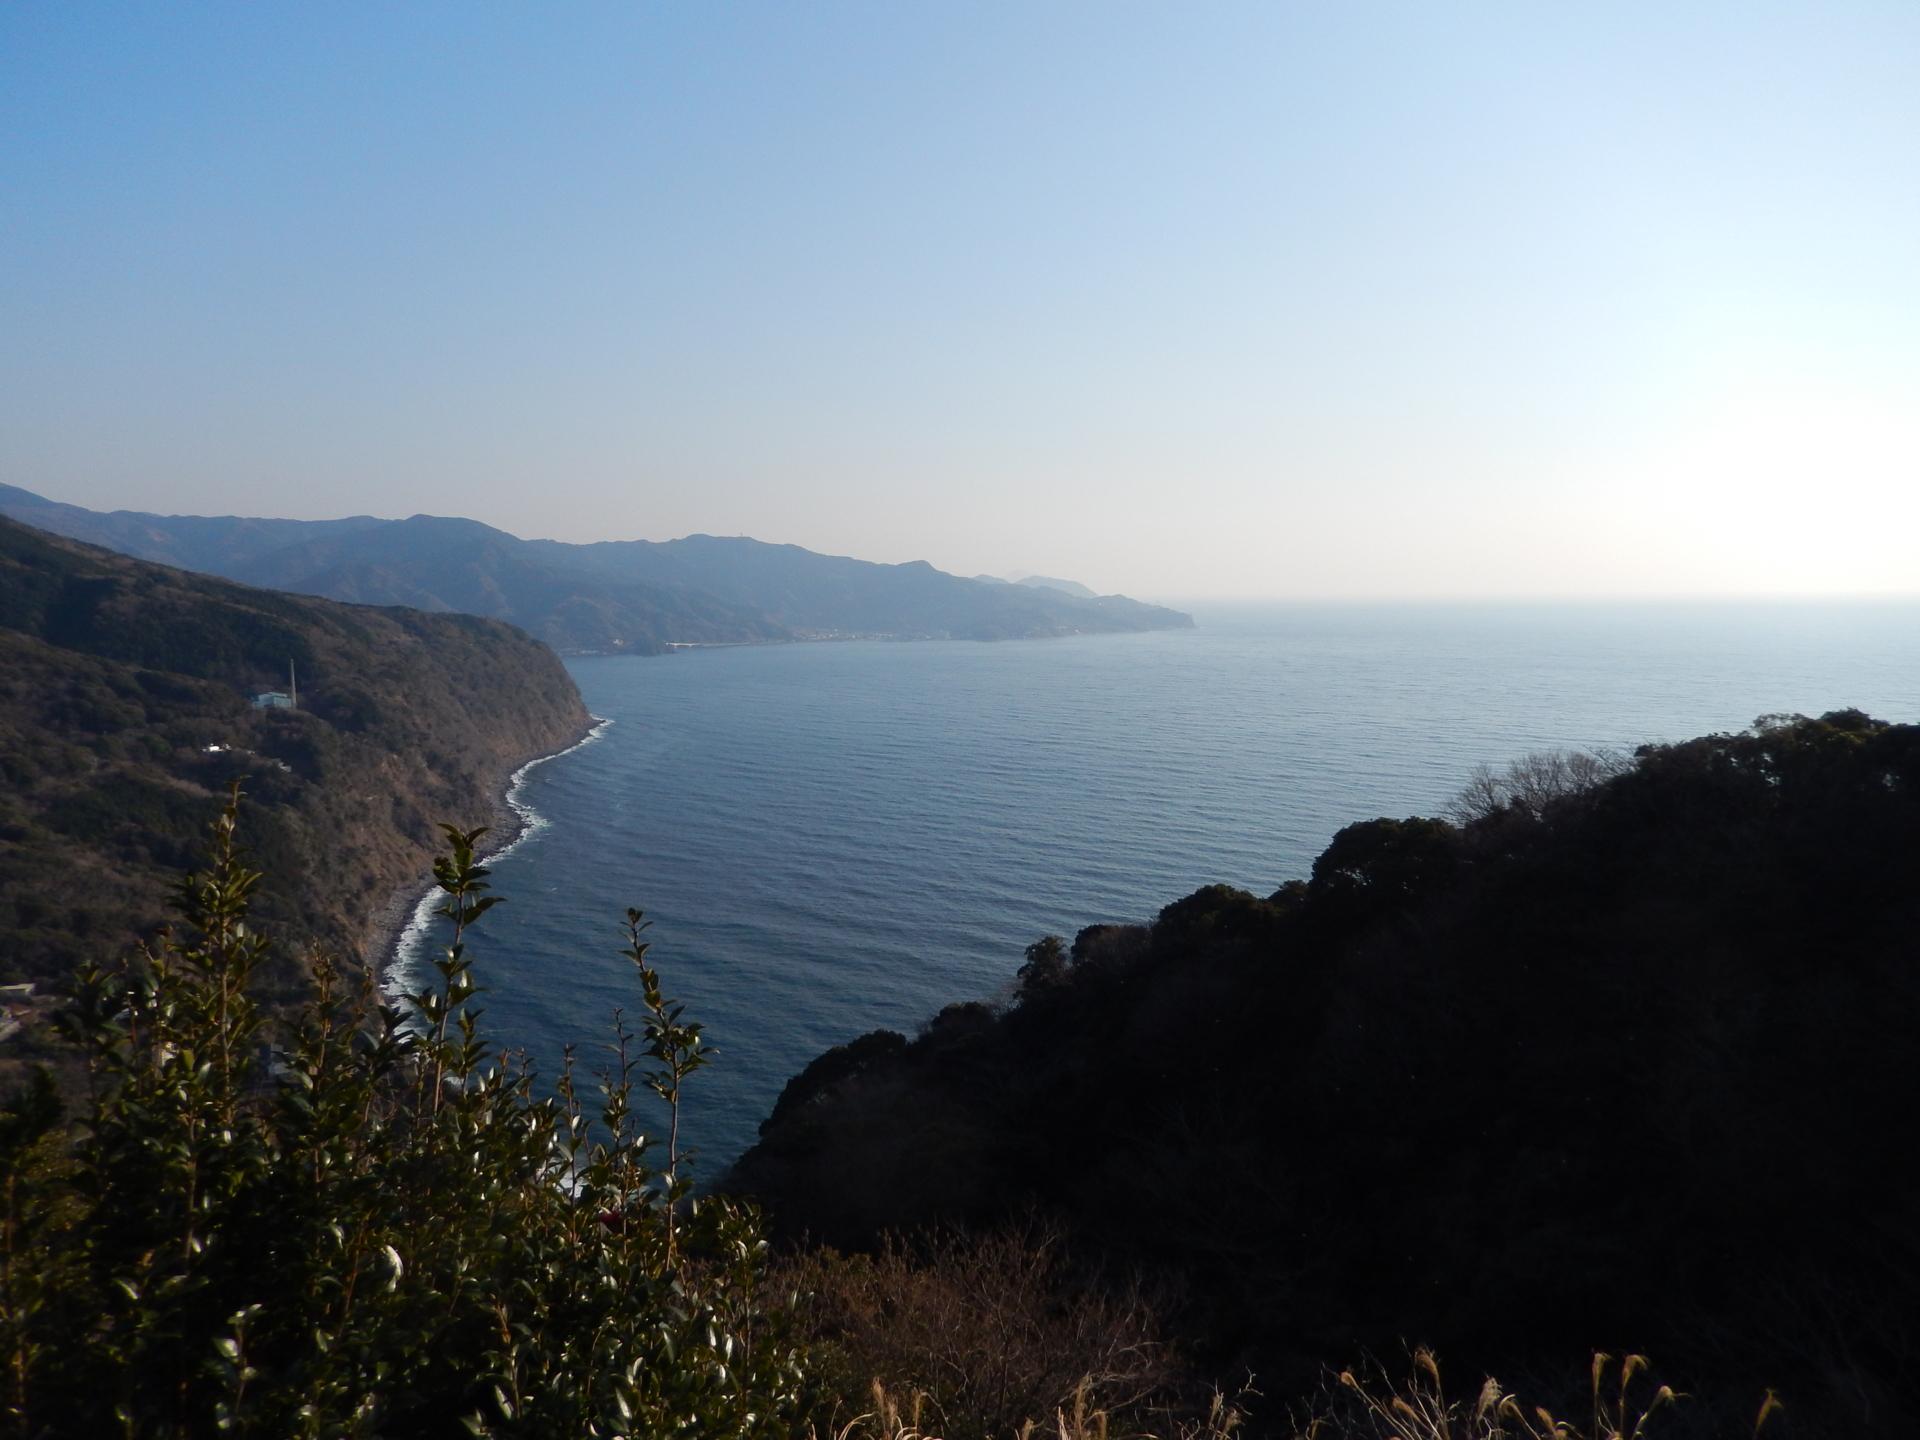 f:id:ToshUeno:20150215155735j:plain